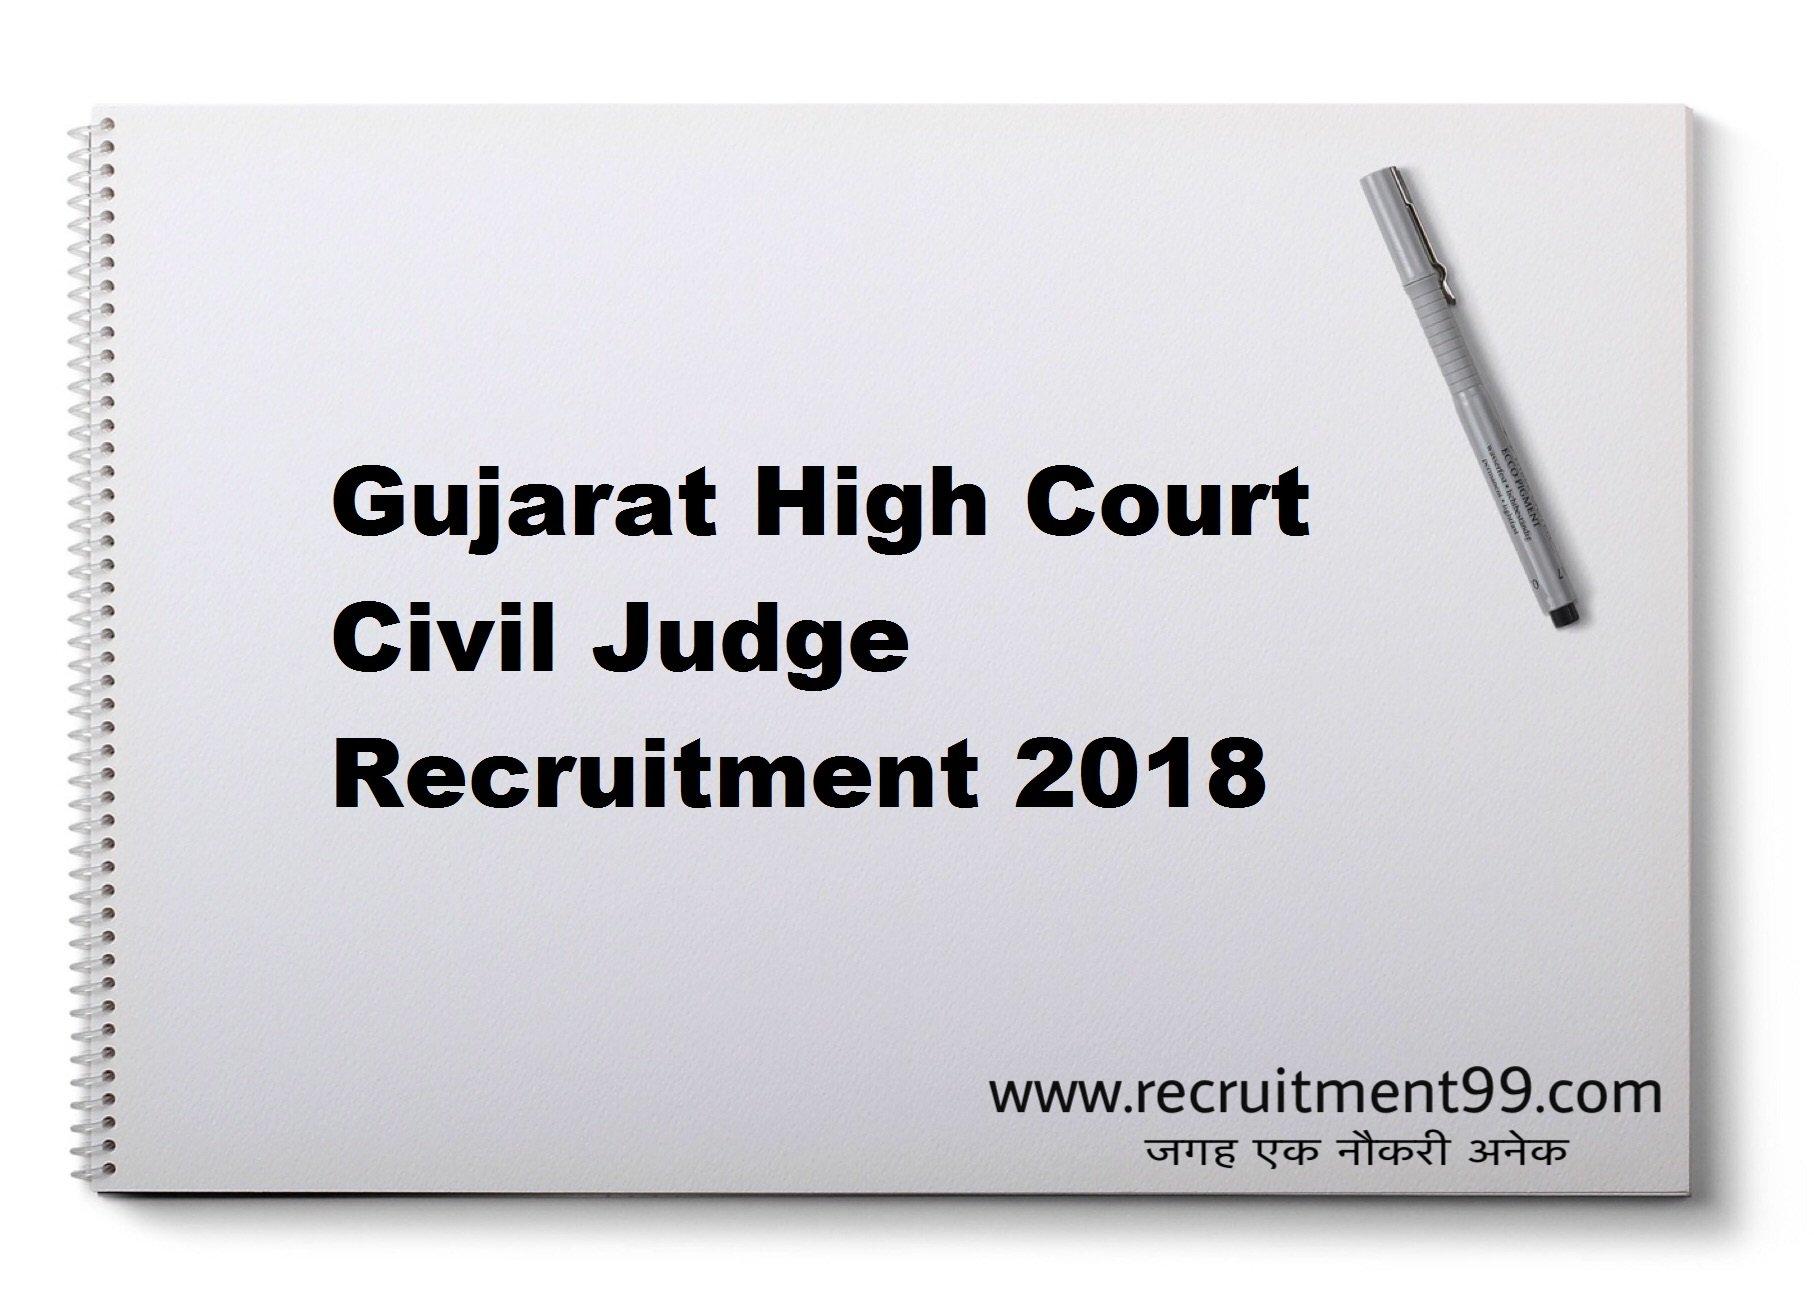 Gujarat High Court Civil Judge Recruitment Admit Card Result 2018